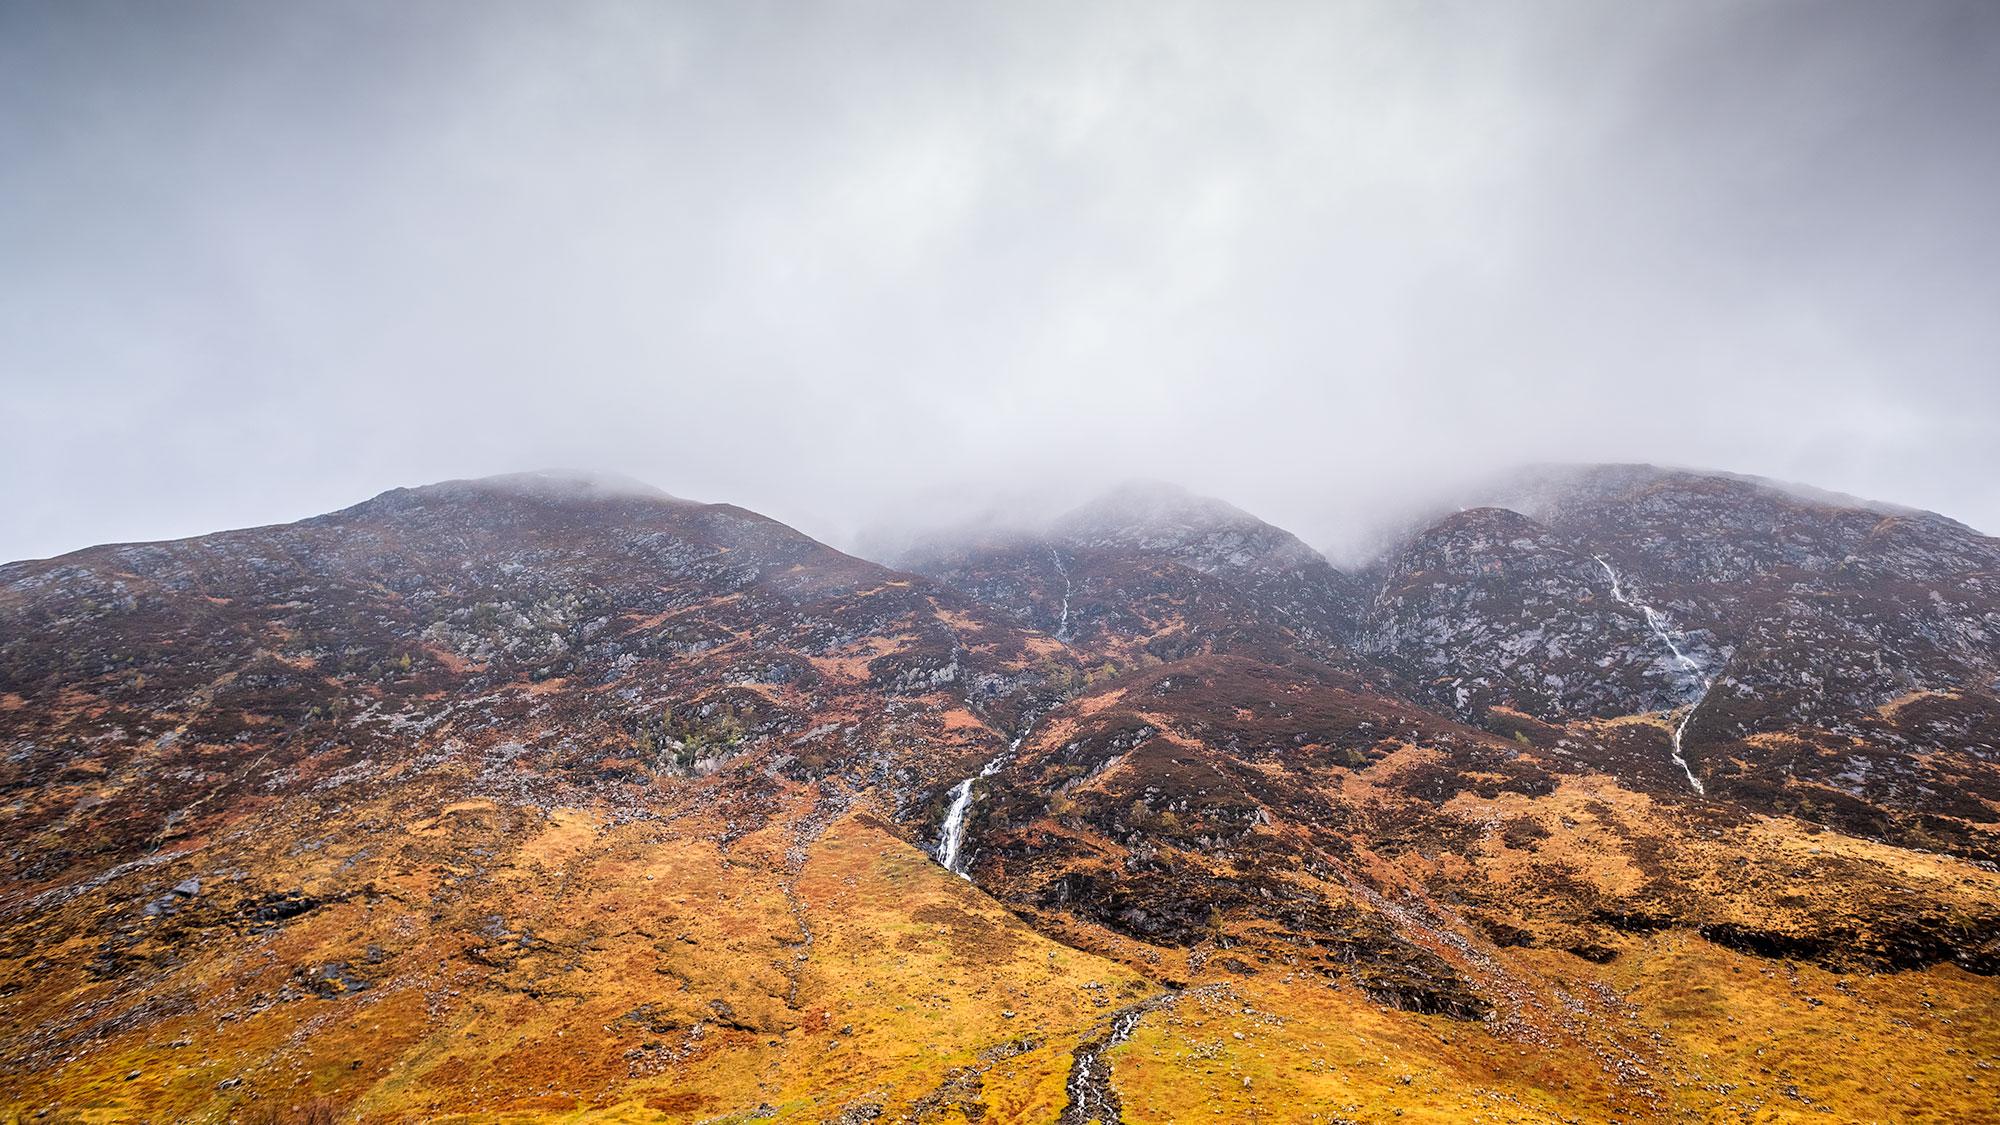 Dramatic and moody landscape photography taken on Skye Island by the photographer Jennifer Esseiva.